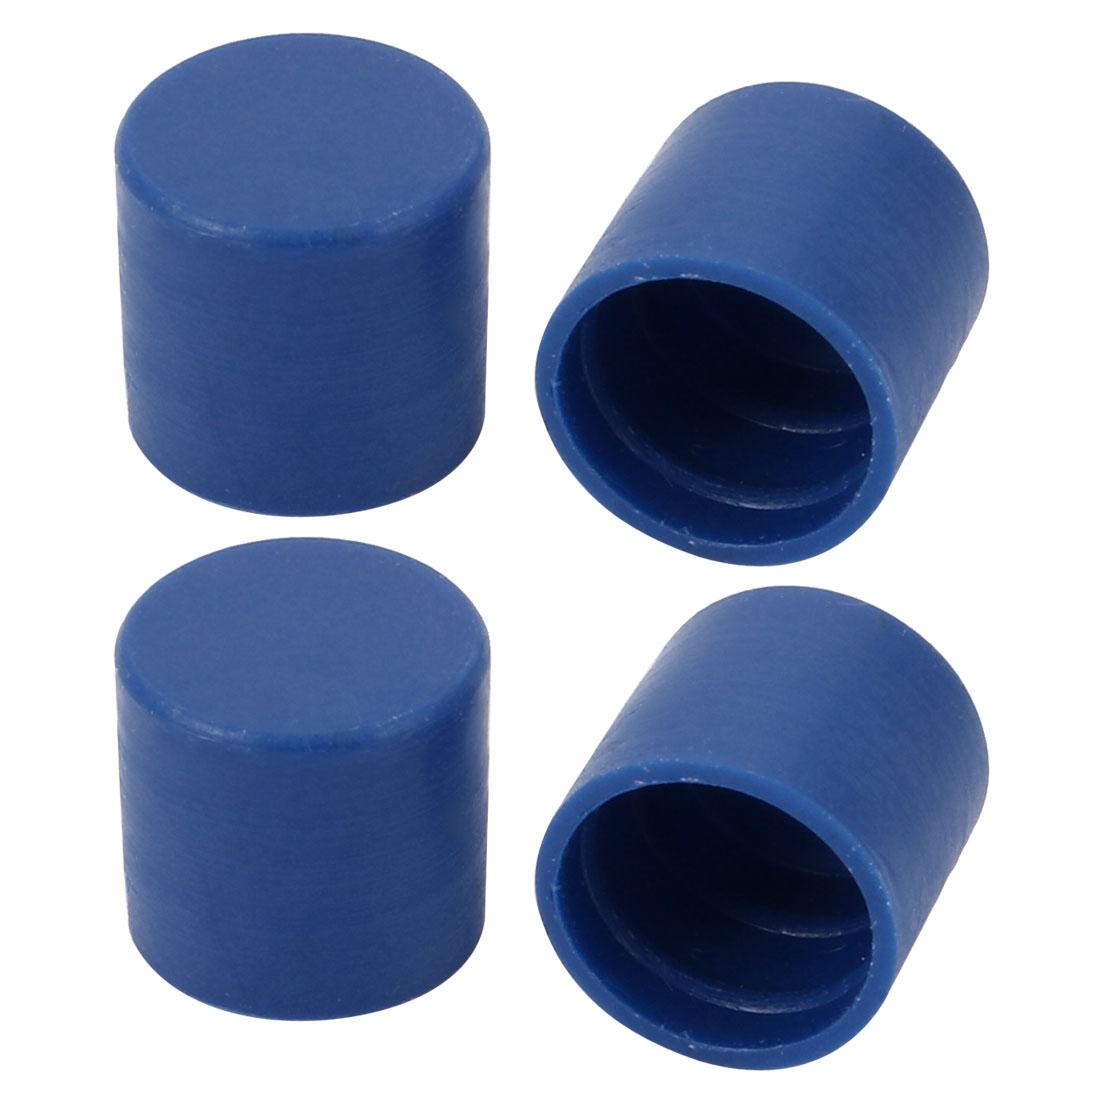 4pcs 10mm Inner Dia PE Plastic End Cap Bolt Thread Protector Tube Cover Blue